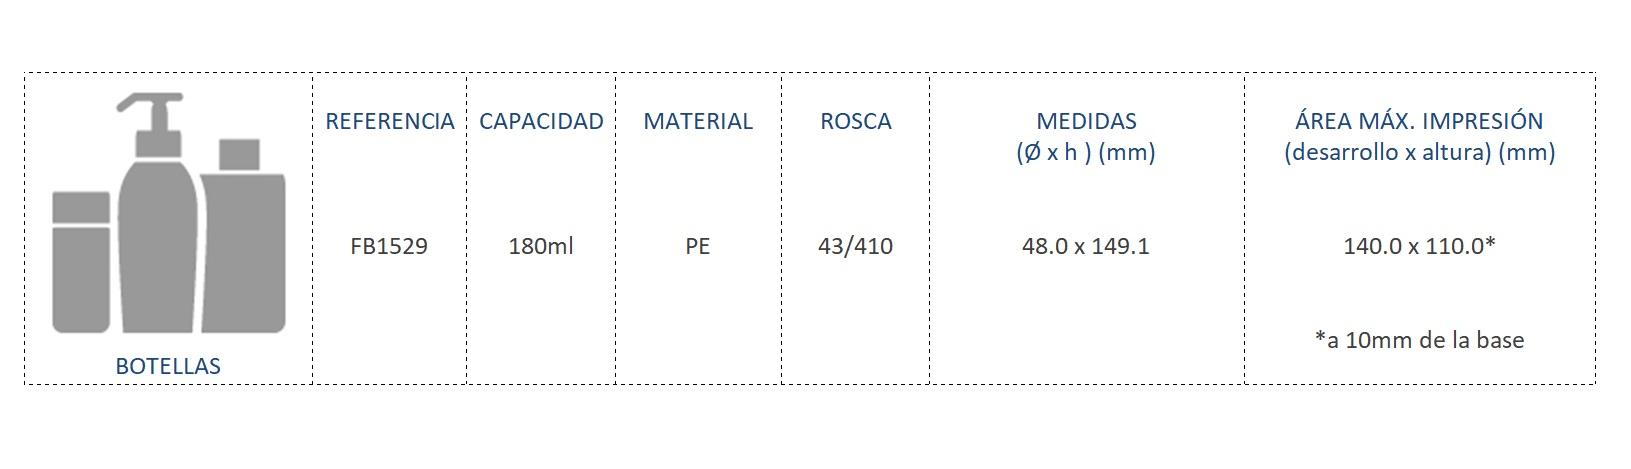 Cuadro de materiales FB1529